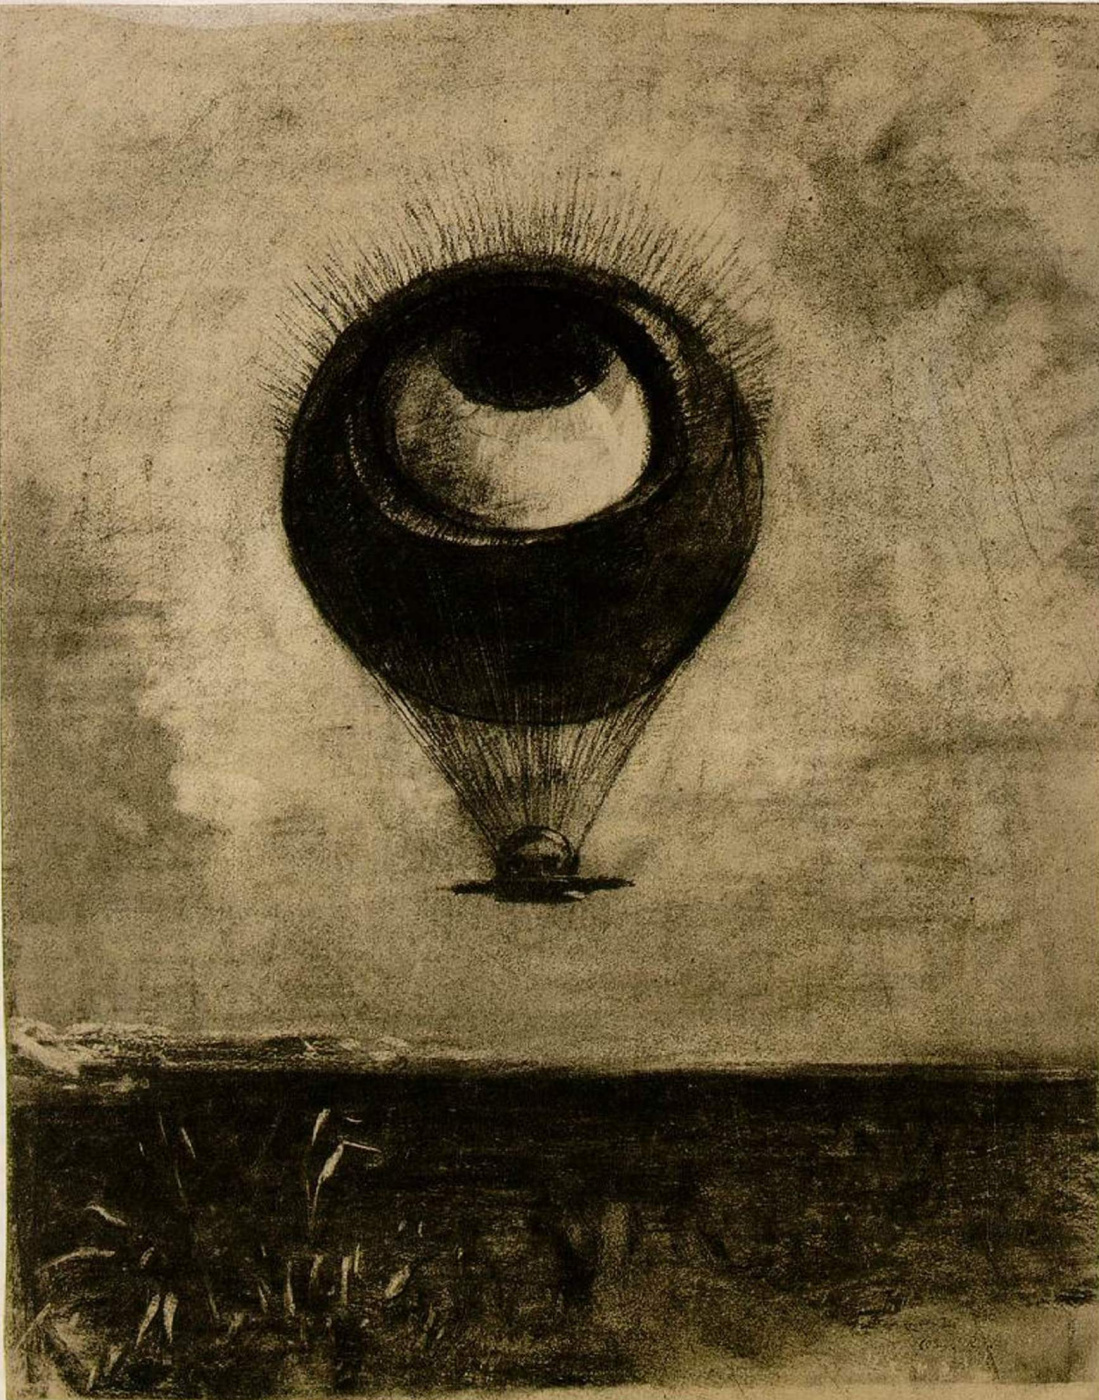 Odilon Redon. Eye-balloon